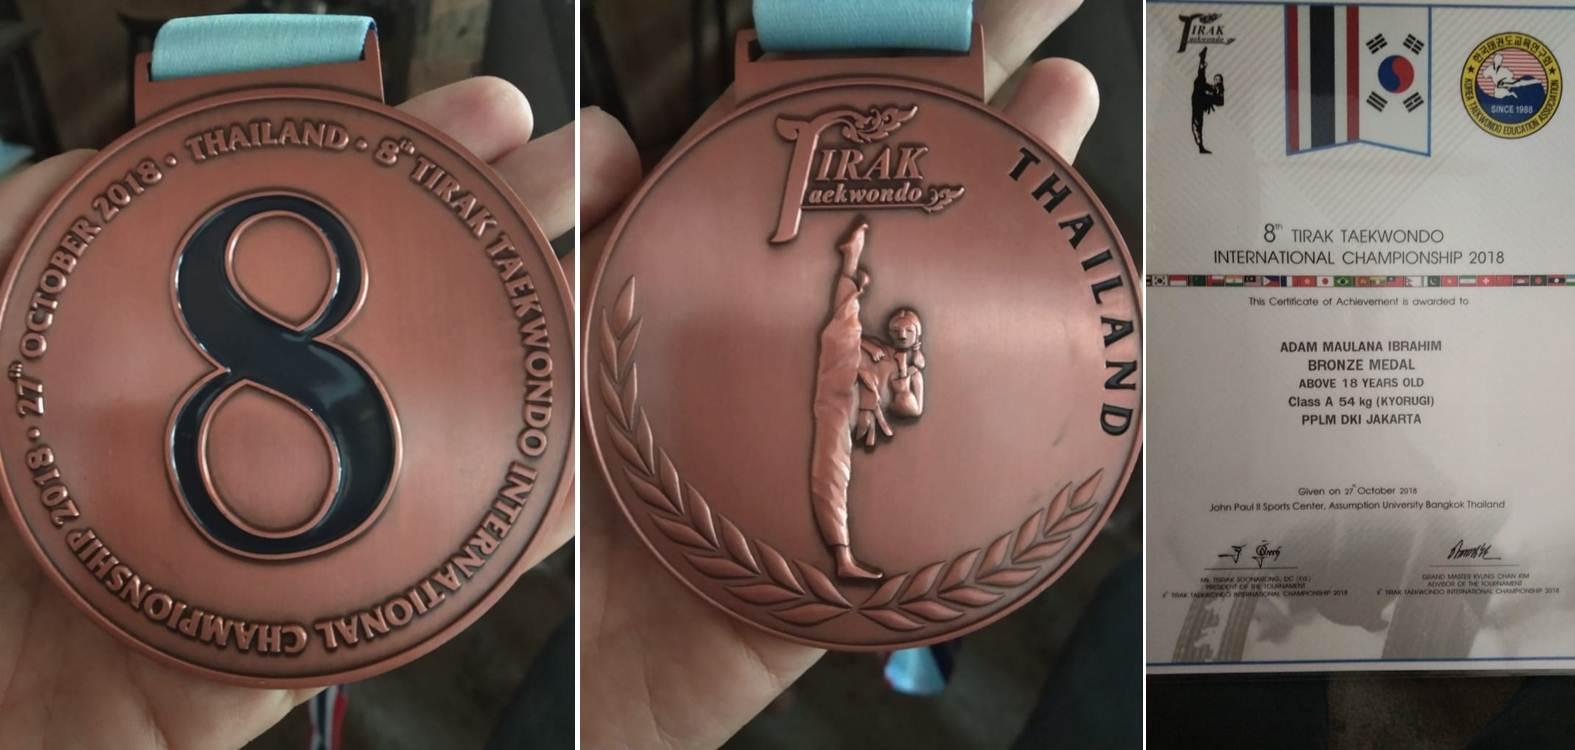 Medali yang didapatkan oleh Dua Mahasiswa Esa Unggul